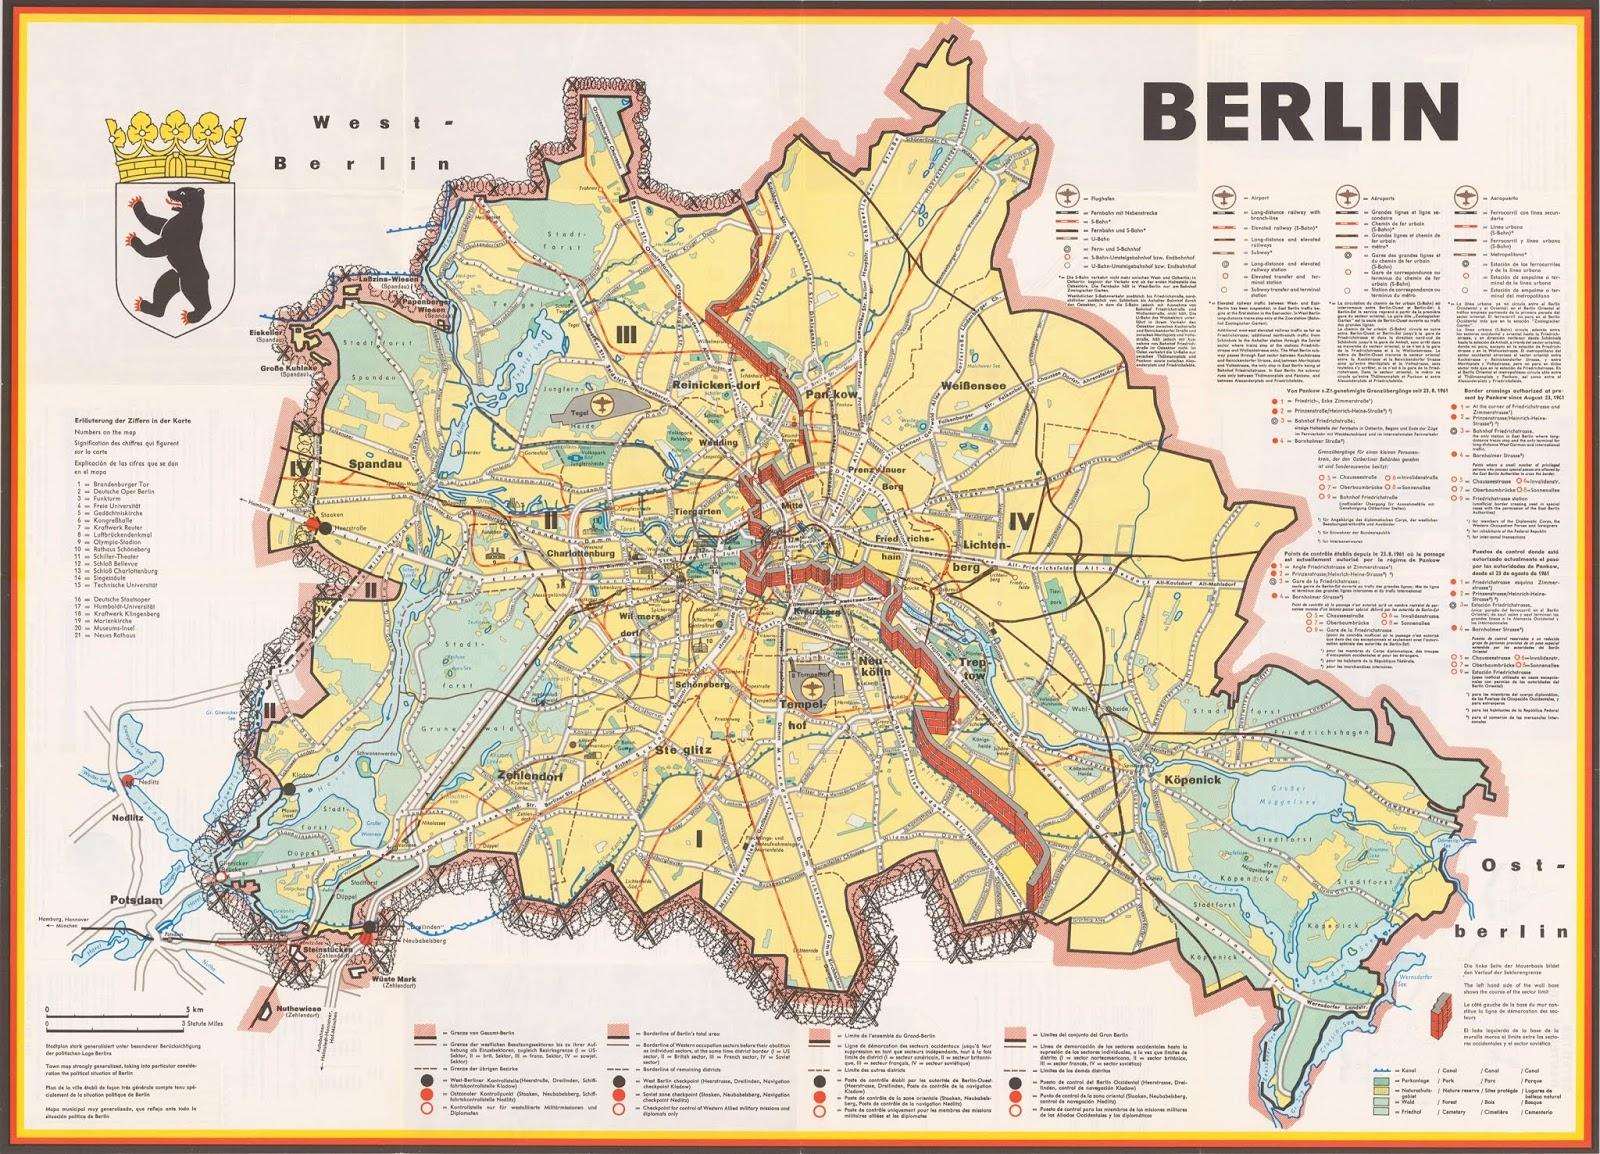 Kodotus Berliinin Muuri Rakennuslupahakemus